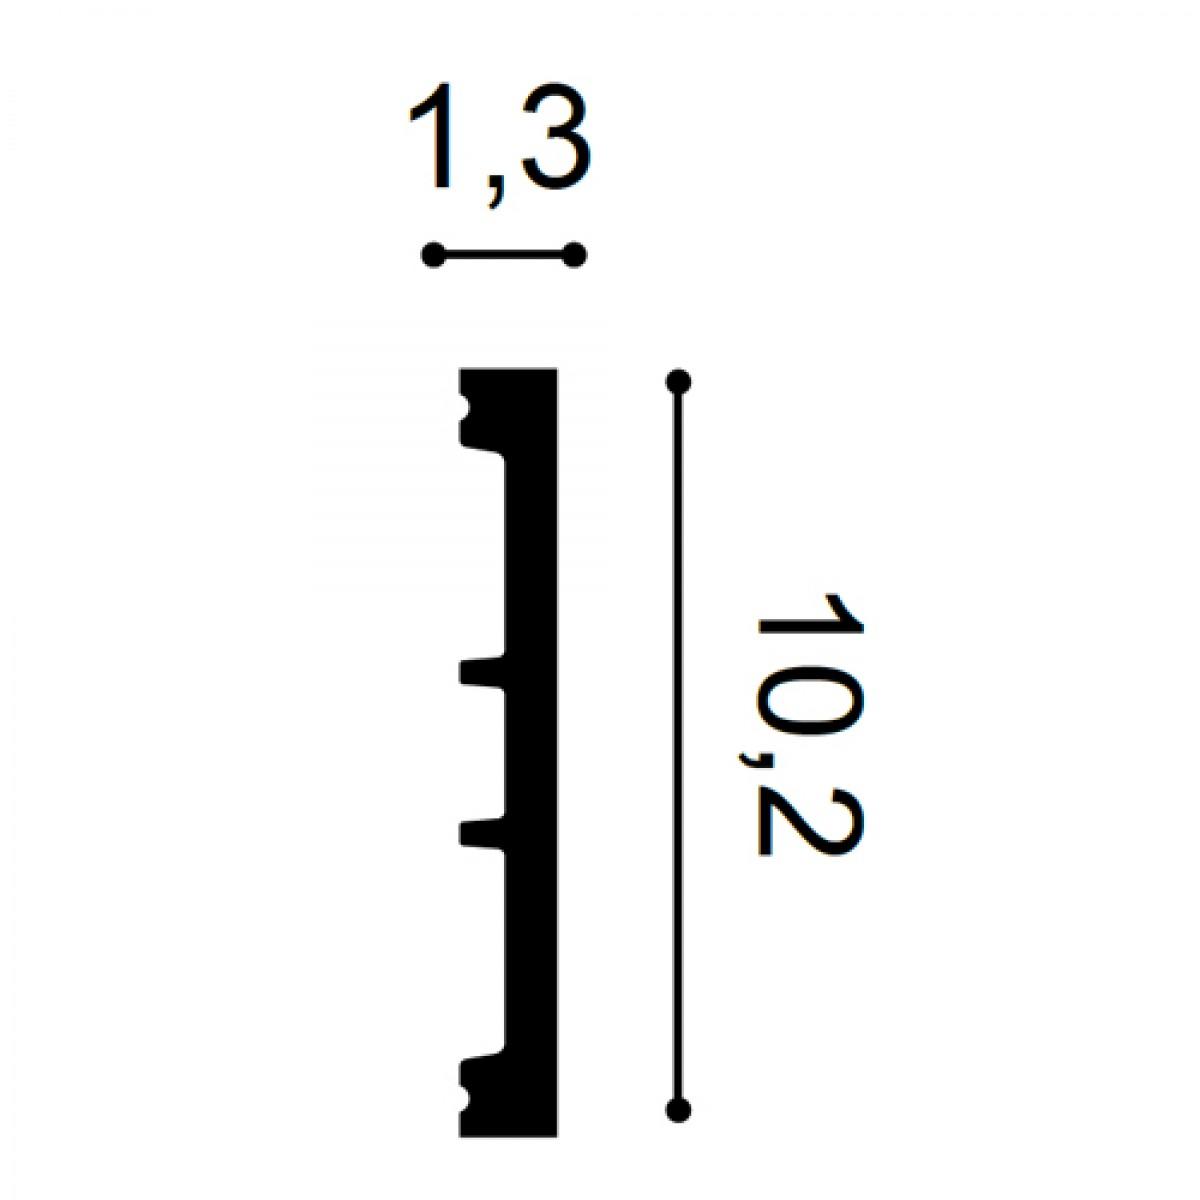 Ancadrament Usa Axxent SX163, Dimensiuni: 200 X 10.2 X 1.3 cm, Orac Decor